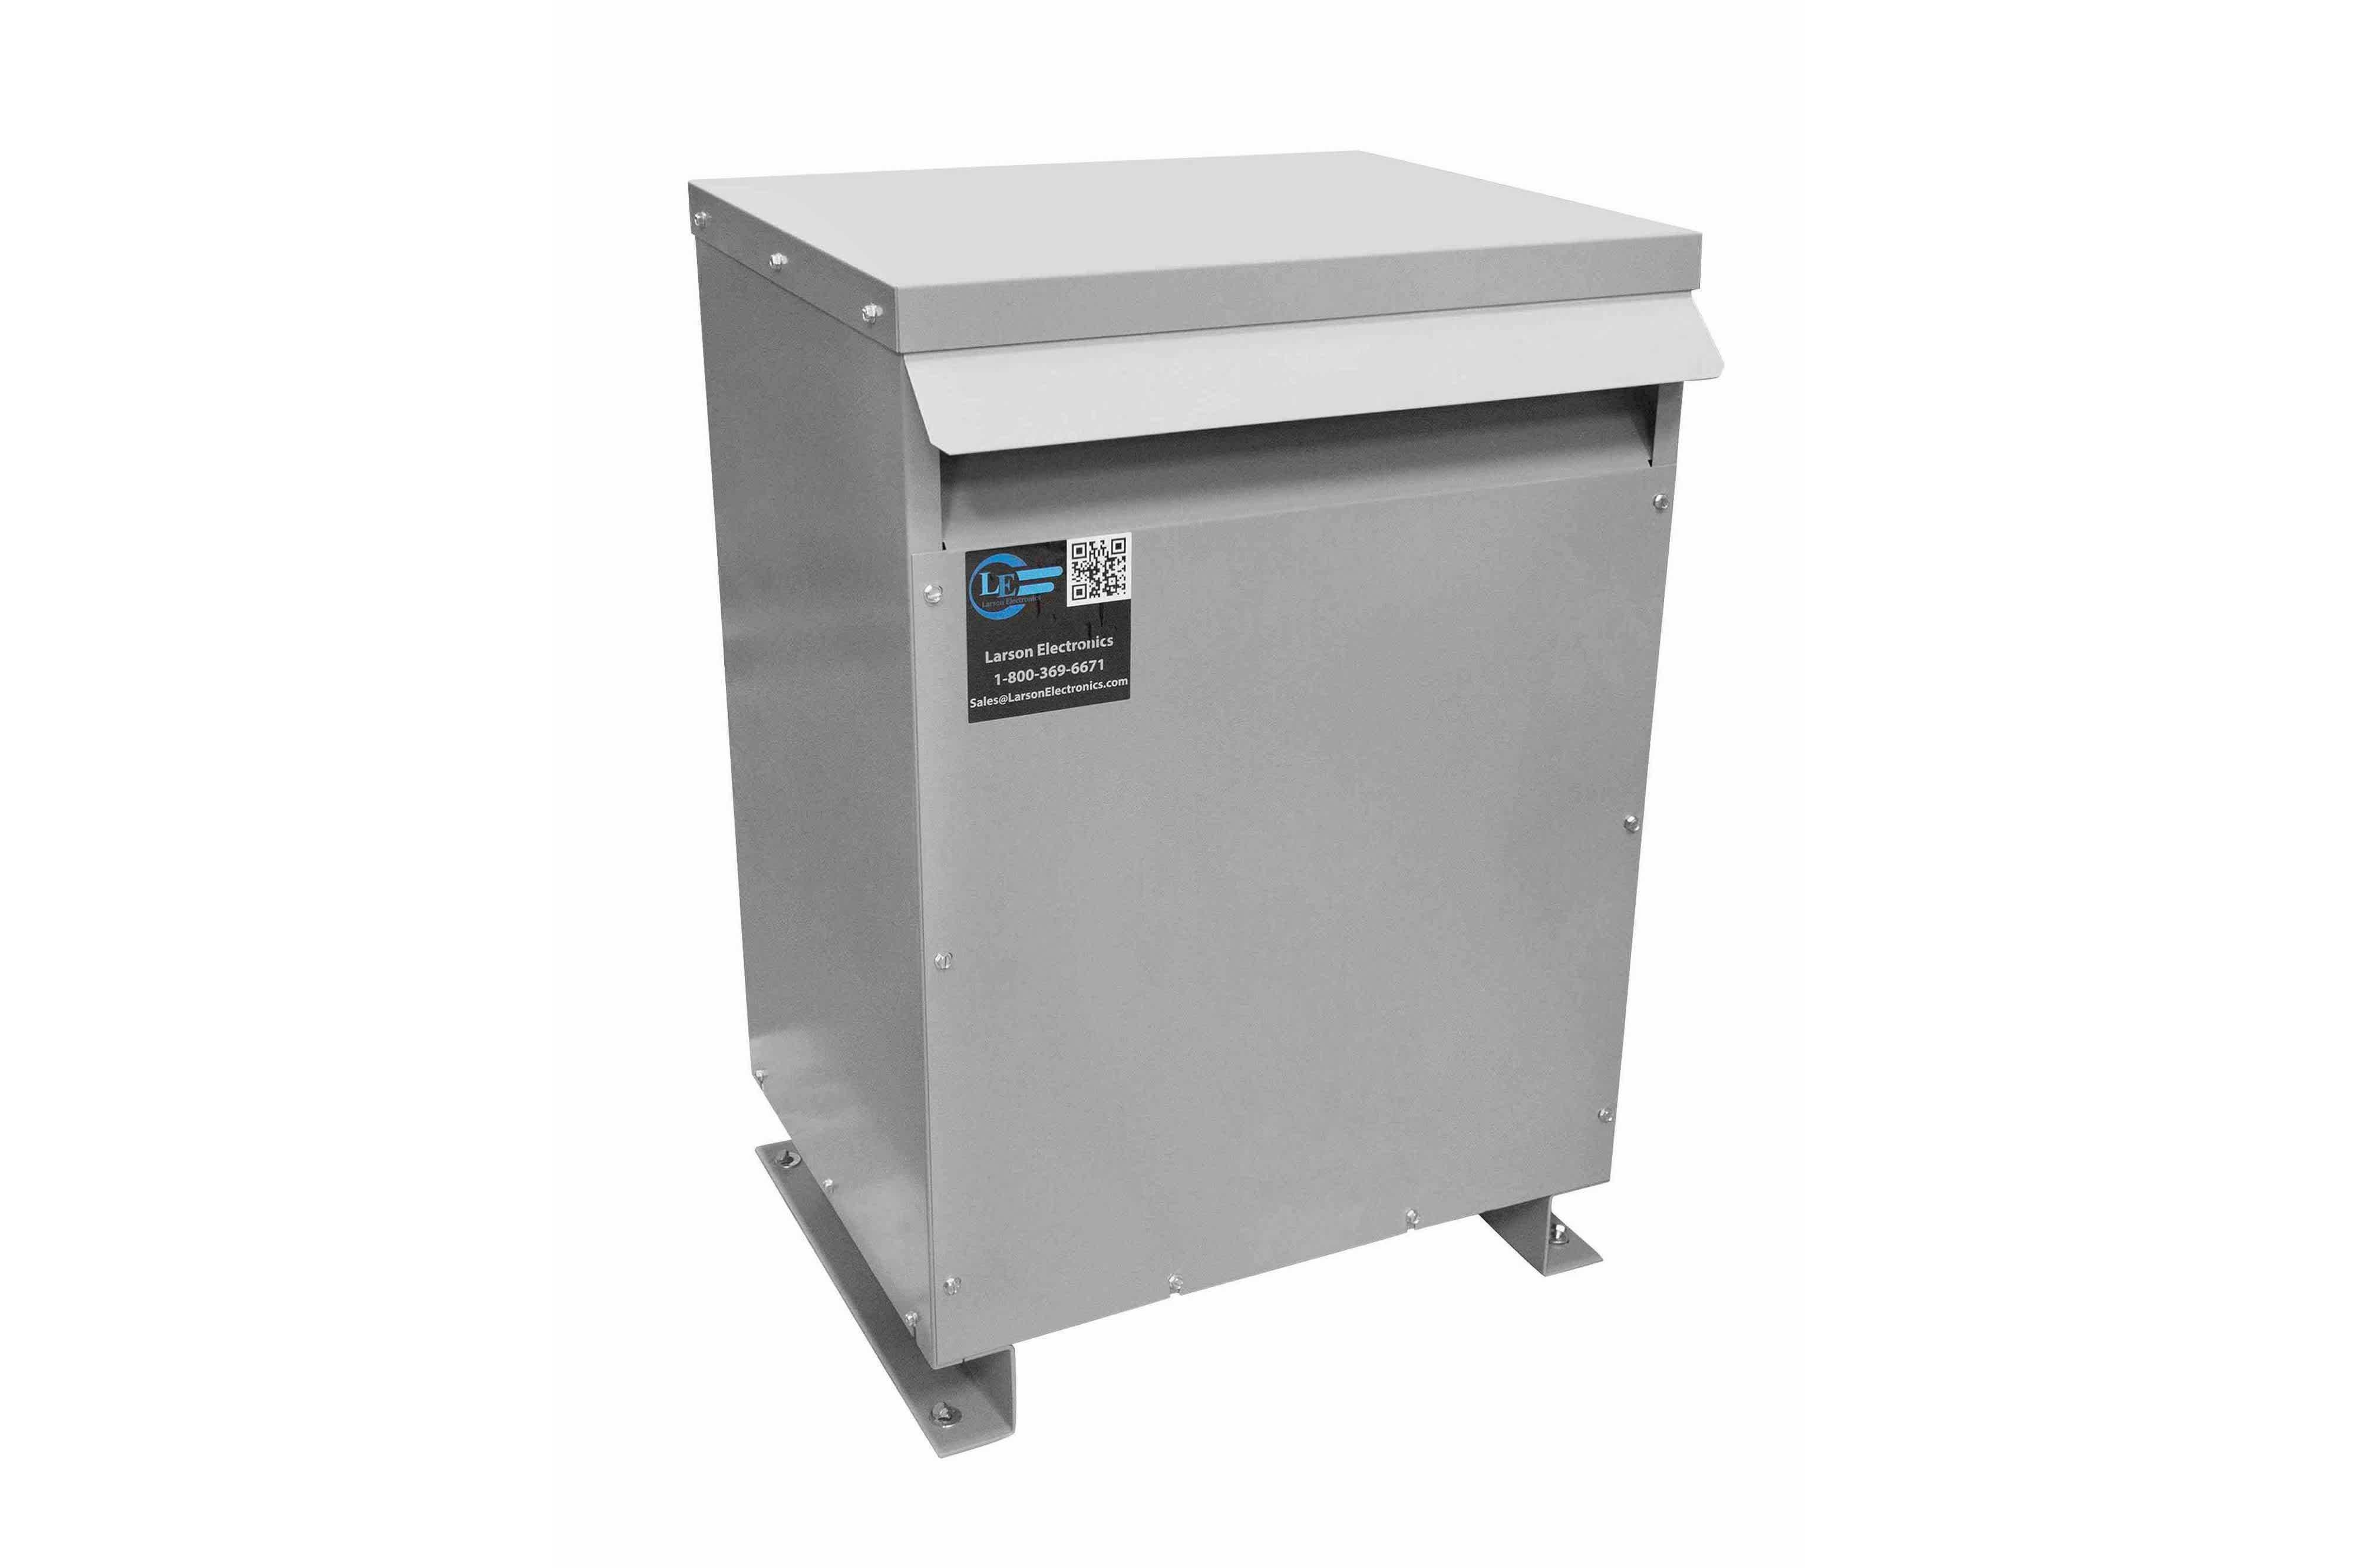 60 kVA 3PH DOE Transformer, 460V Delta Primary, 575Y/332 Wye-N Secondary, N3R, Ventilated, 60 Hz